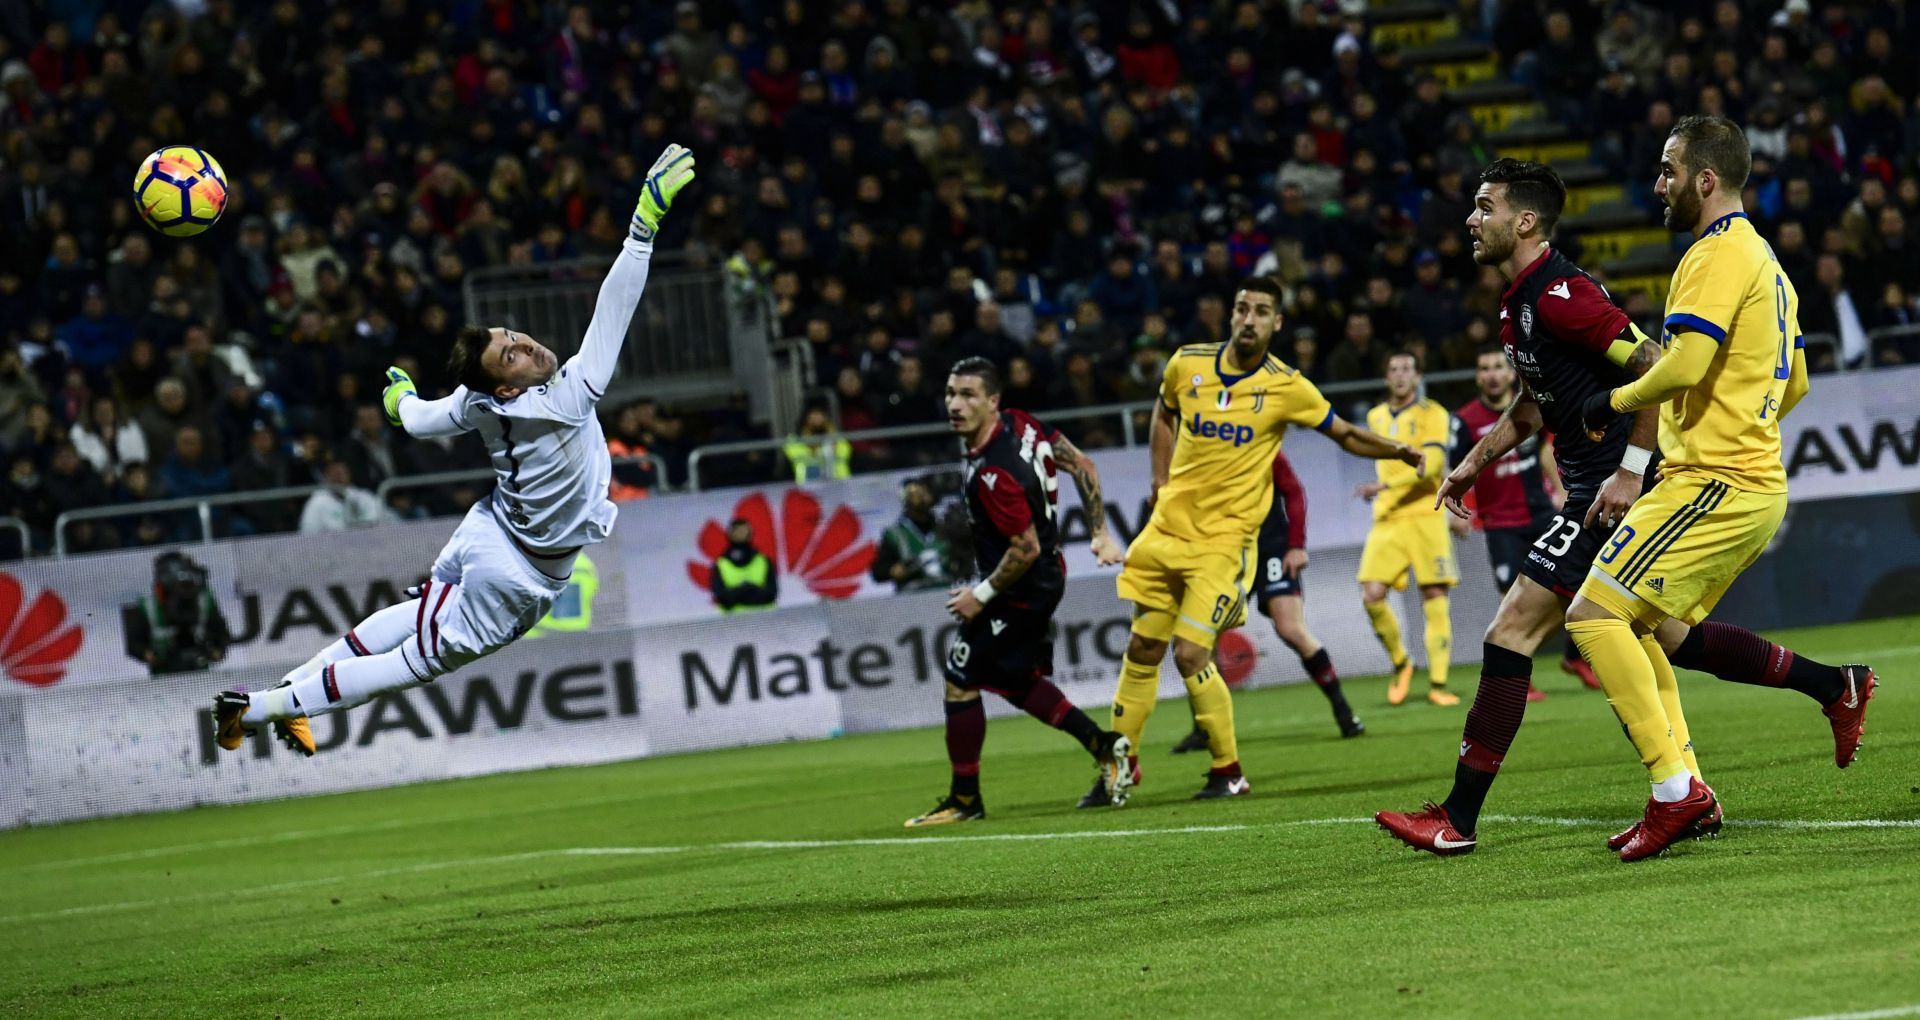 Rafael Cagliari Juventus Serie A